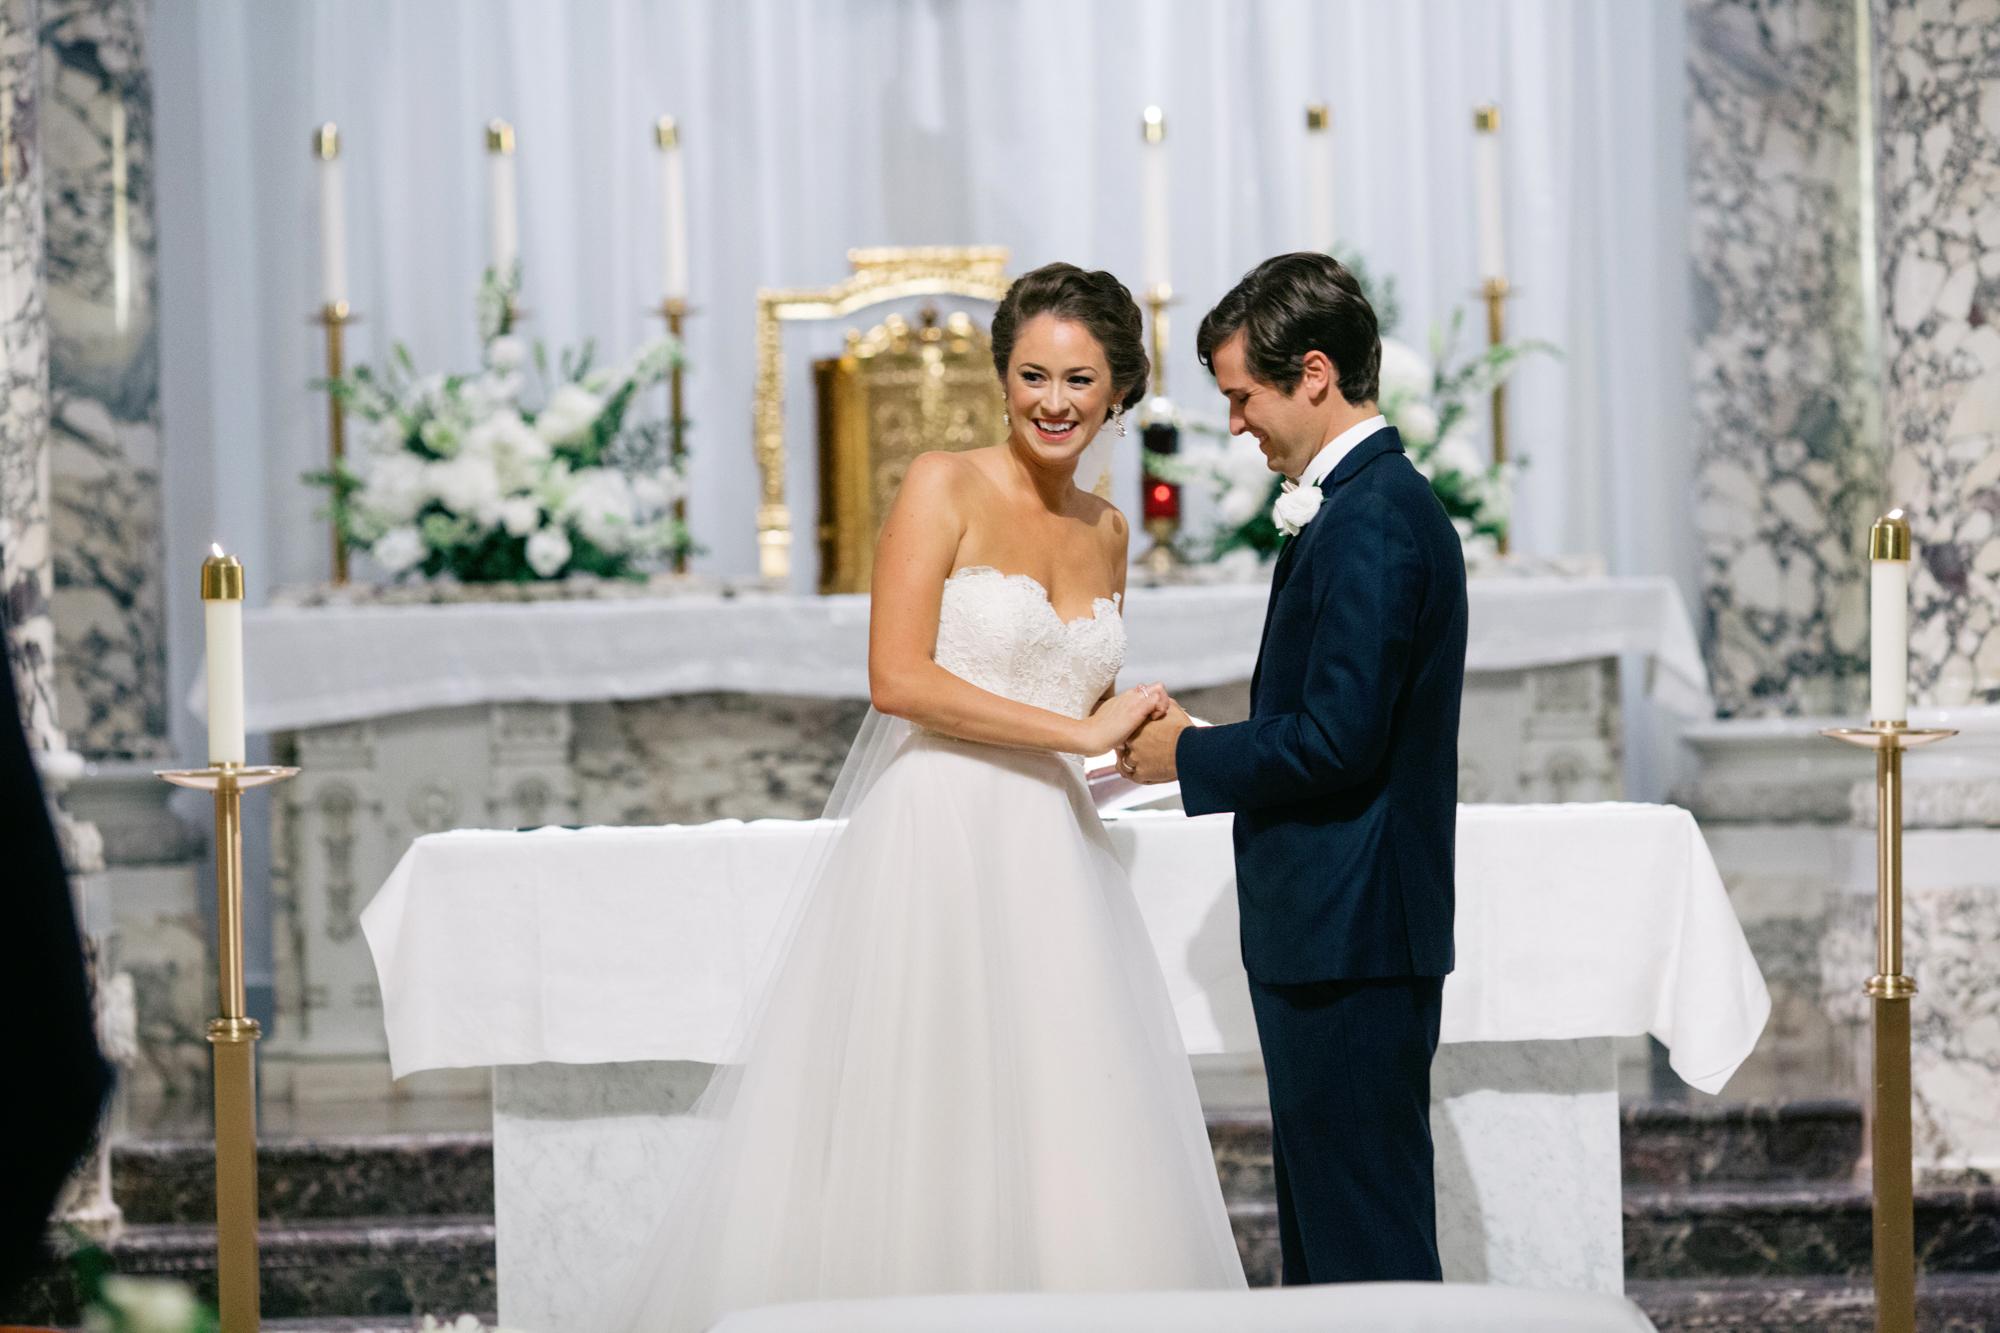 Gulfport_Wedding_Photographer-73.jpg